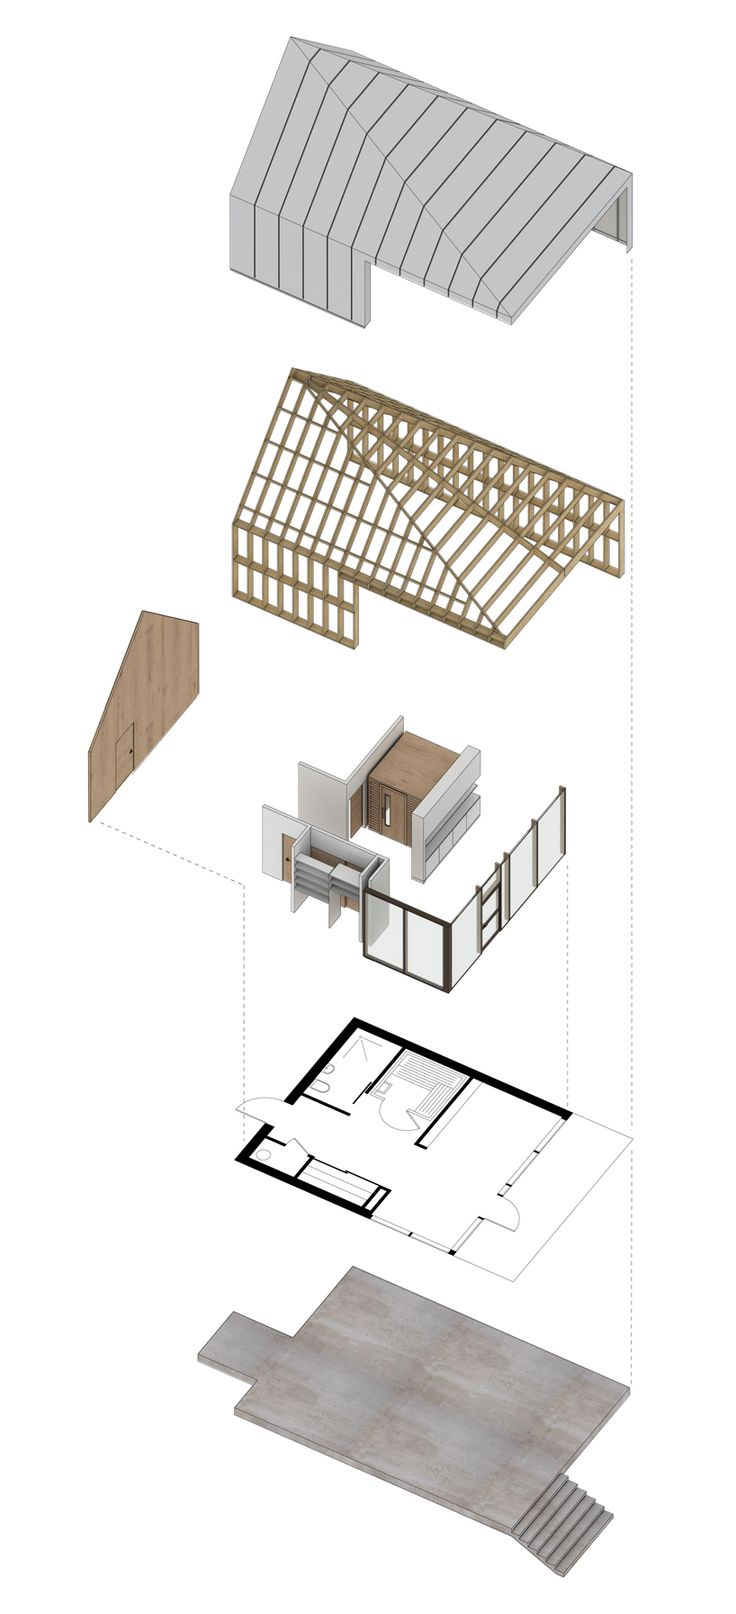 17 best modular living units images on pinterest manufactured housing prefab homes and prefab. Black Bedroom Furniture Sets. Home Design Ideas